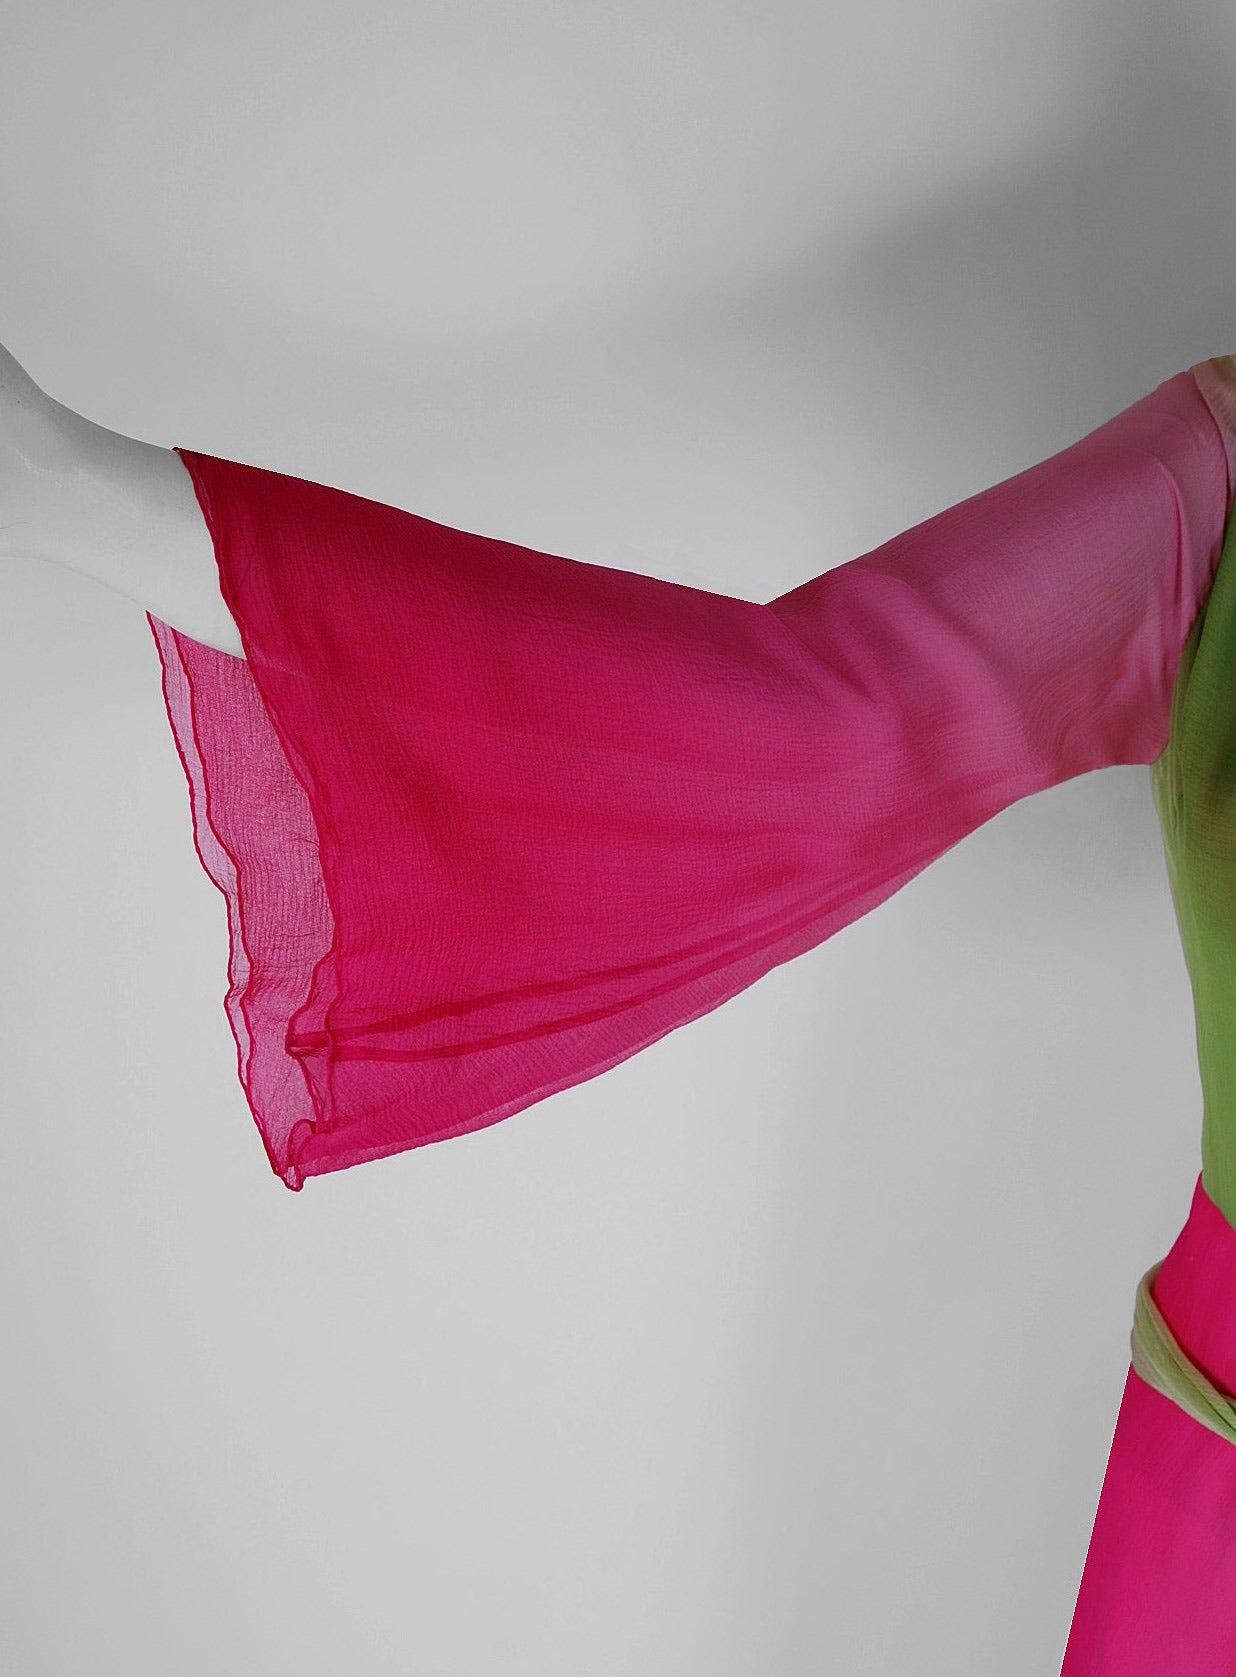 1970's Pauline Trigere Pink & Green Ombre Silk Chiffon Bell-Sleeve Goddess Gown 4